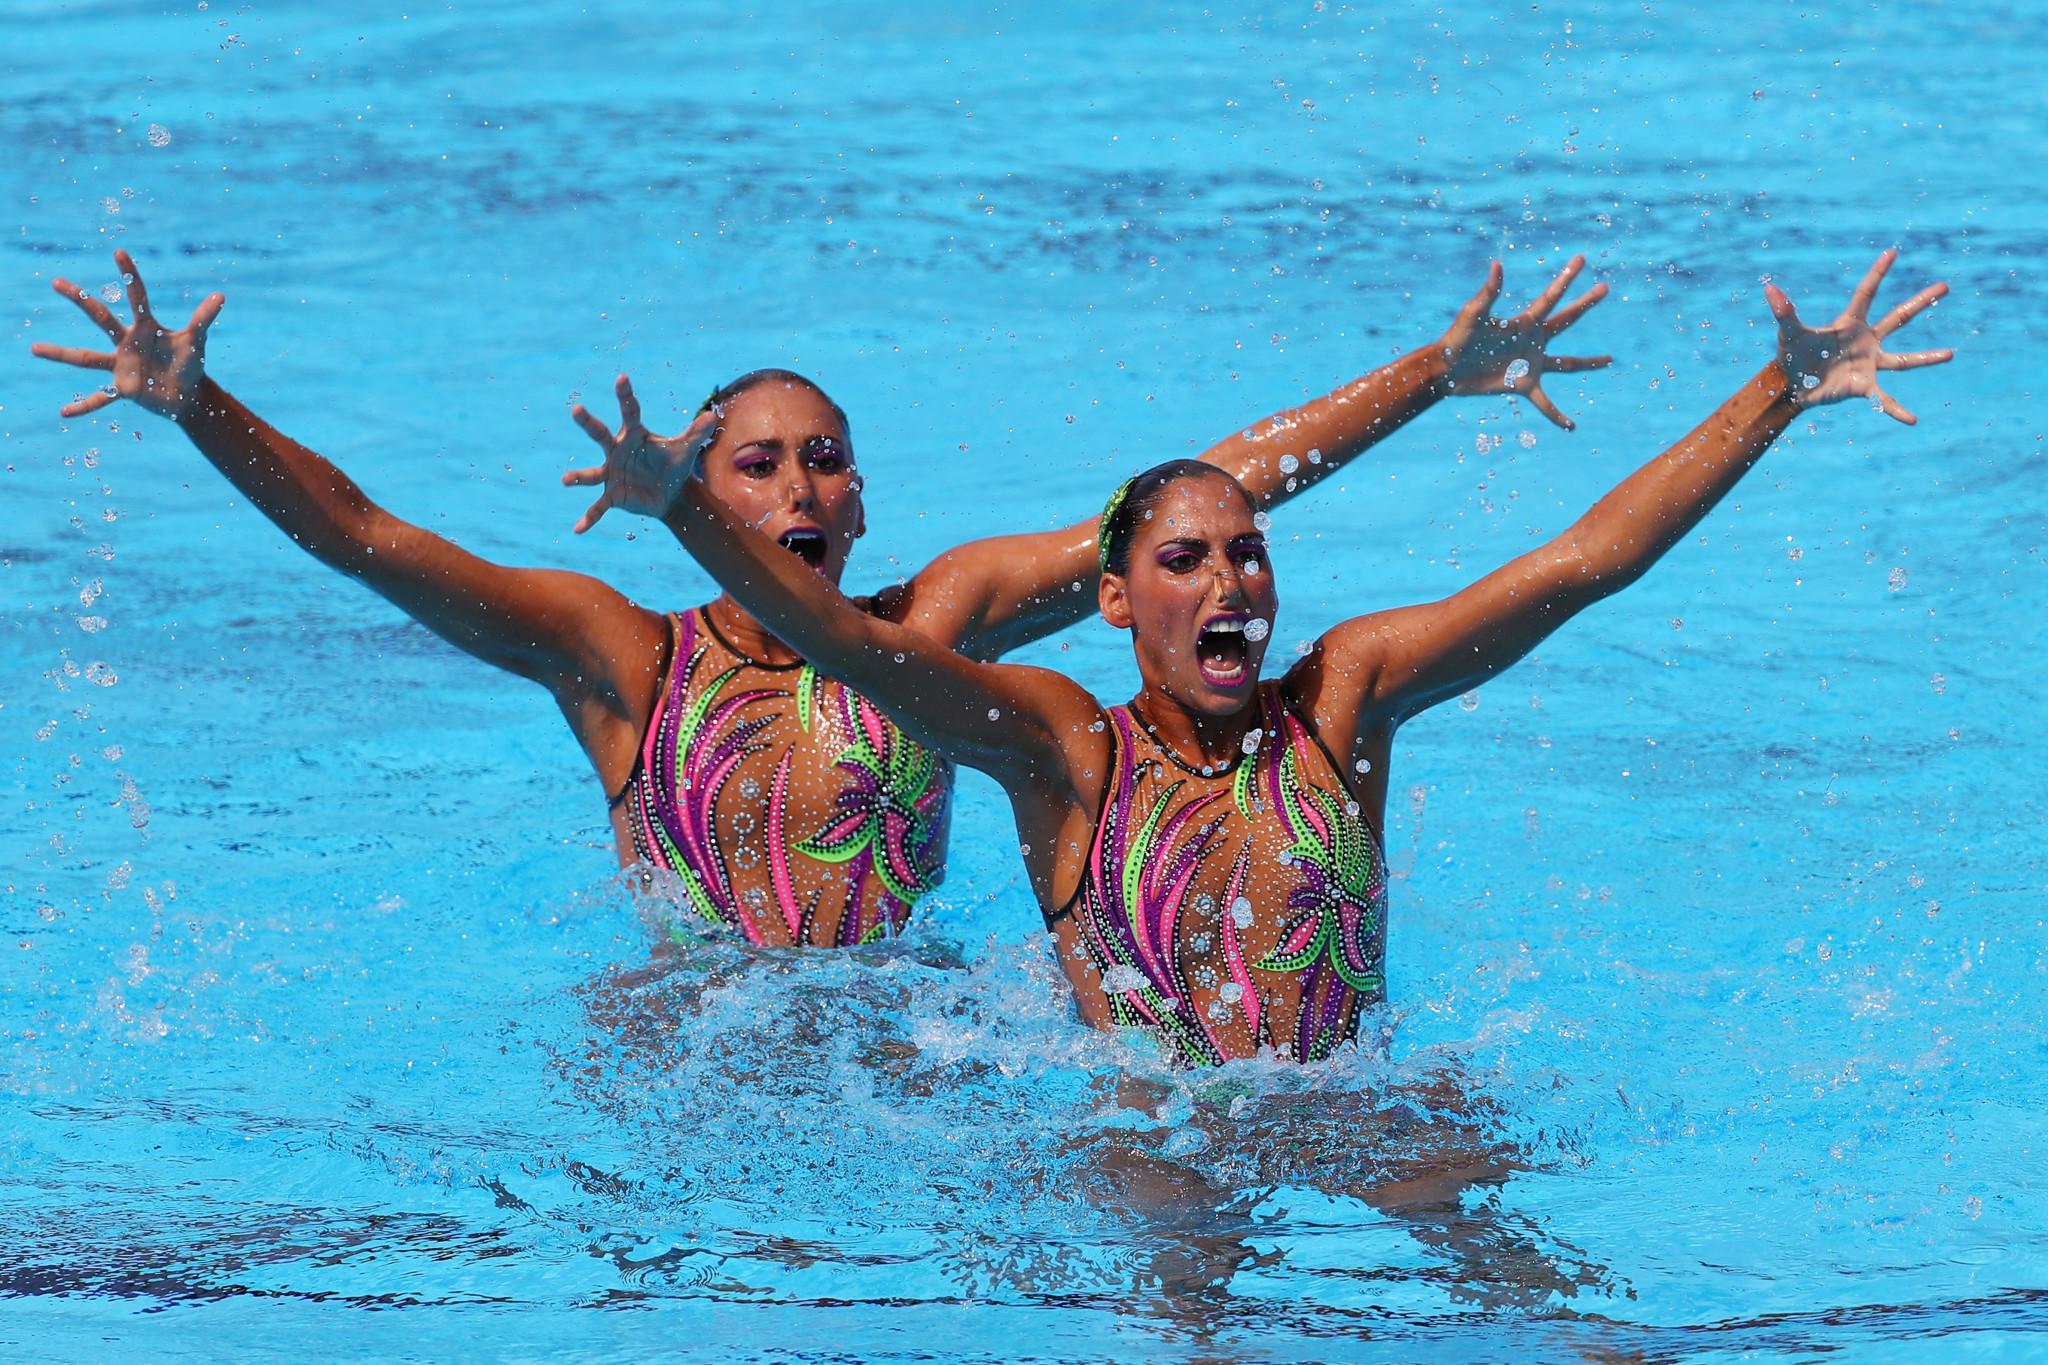 Mexico's Karen Achach and Nuria Diosdado Garcia won the duet free gold medal ©Getty Images